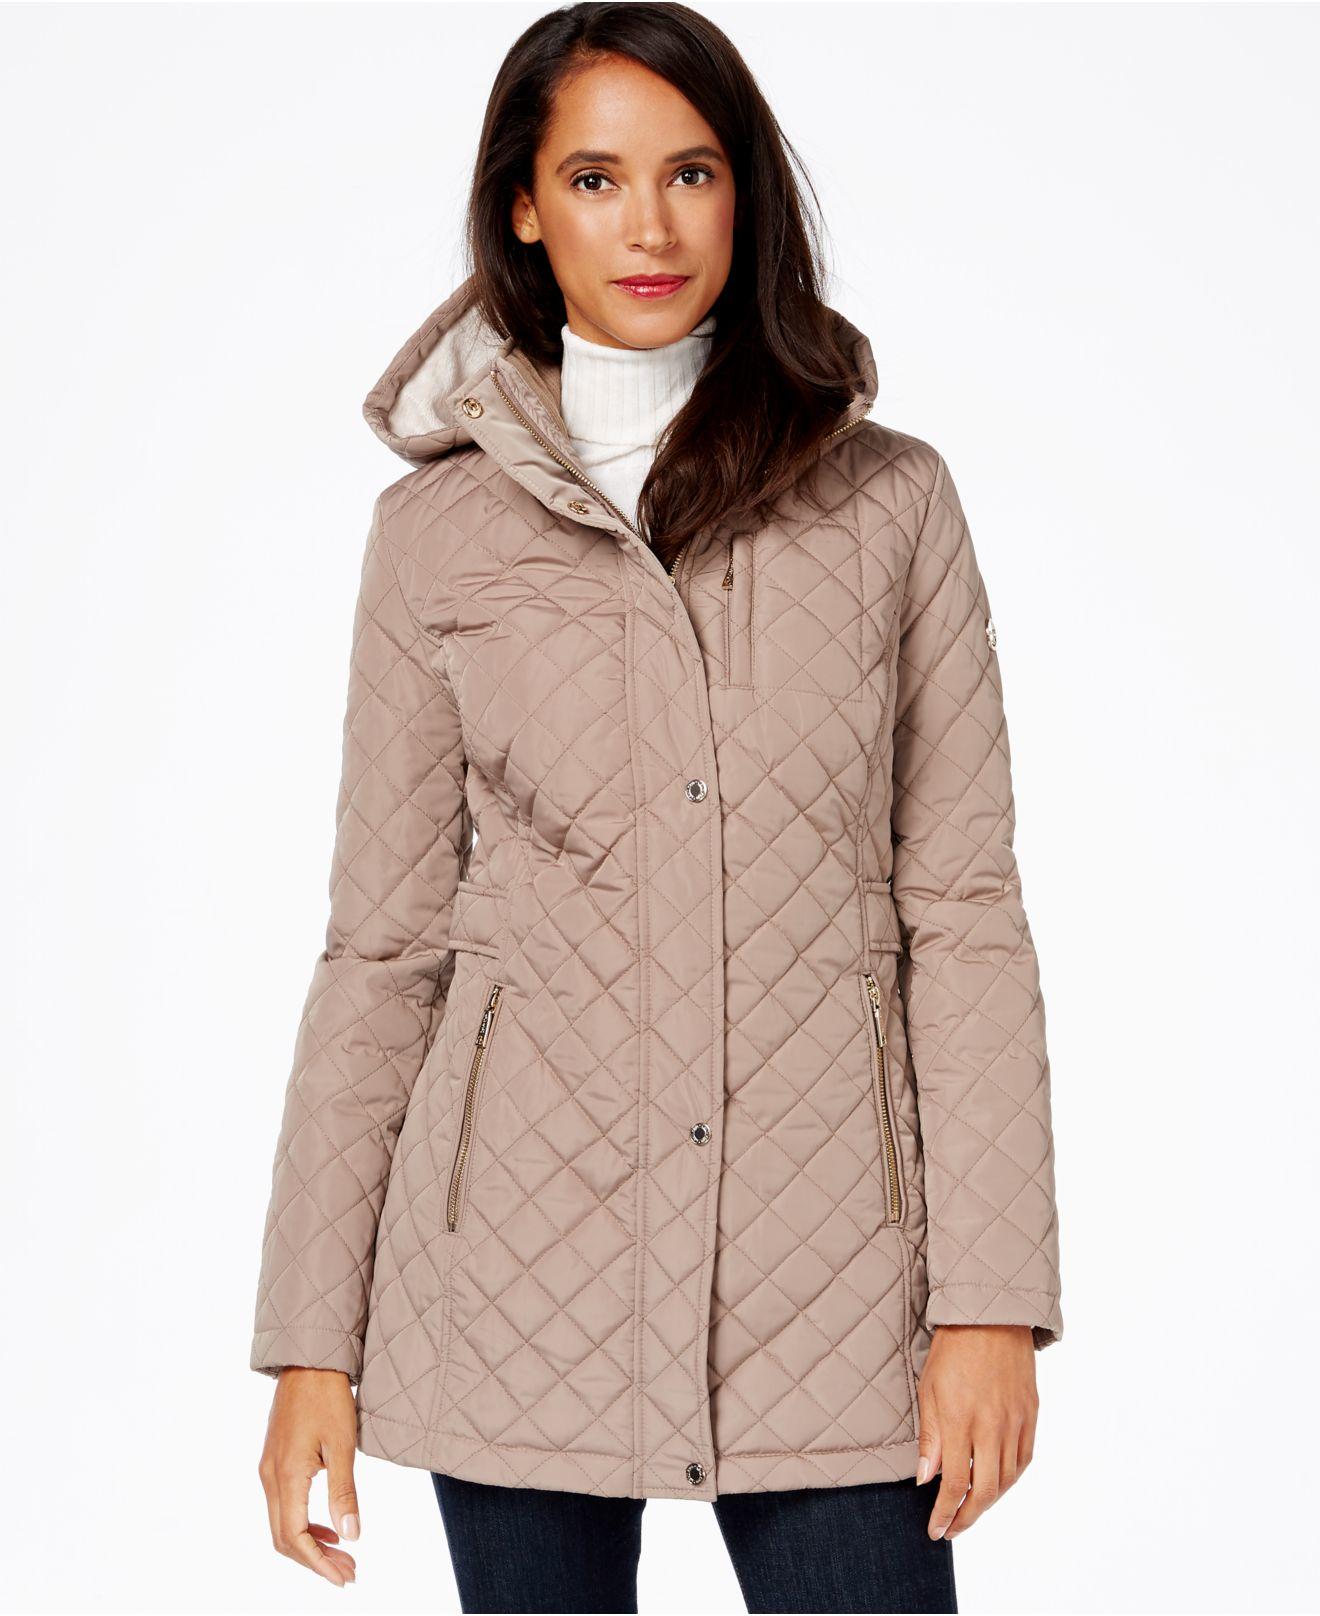 d4ec25ec039d Calvin Klein Hooded Quilted Puffer Coat - Best Quilt Grafimage.co